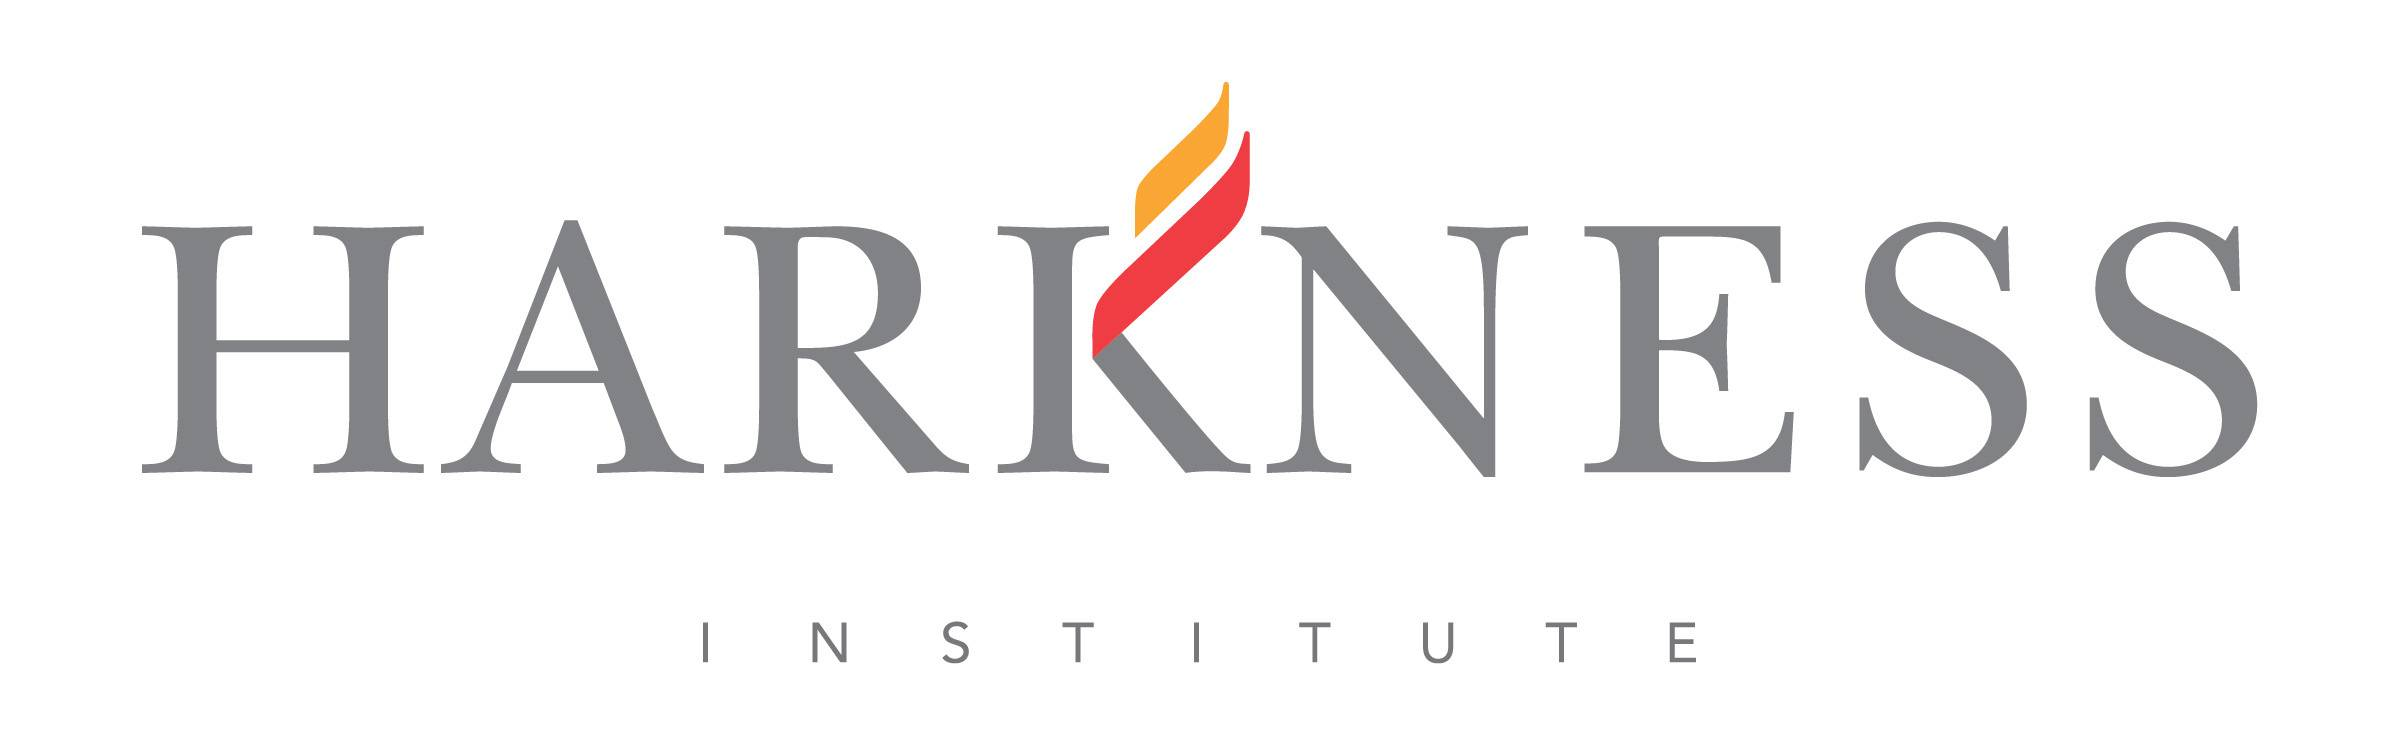 Logo de Harkness Initiative